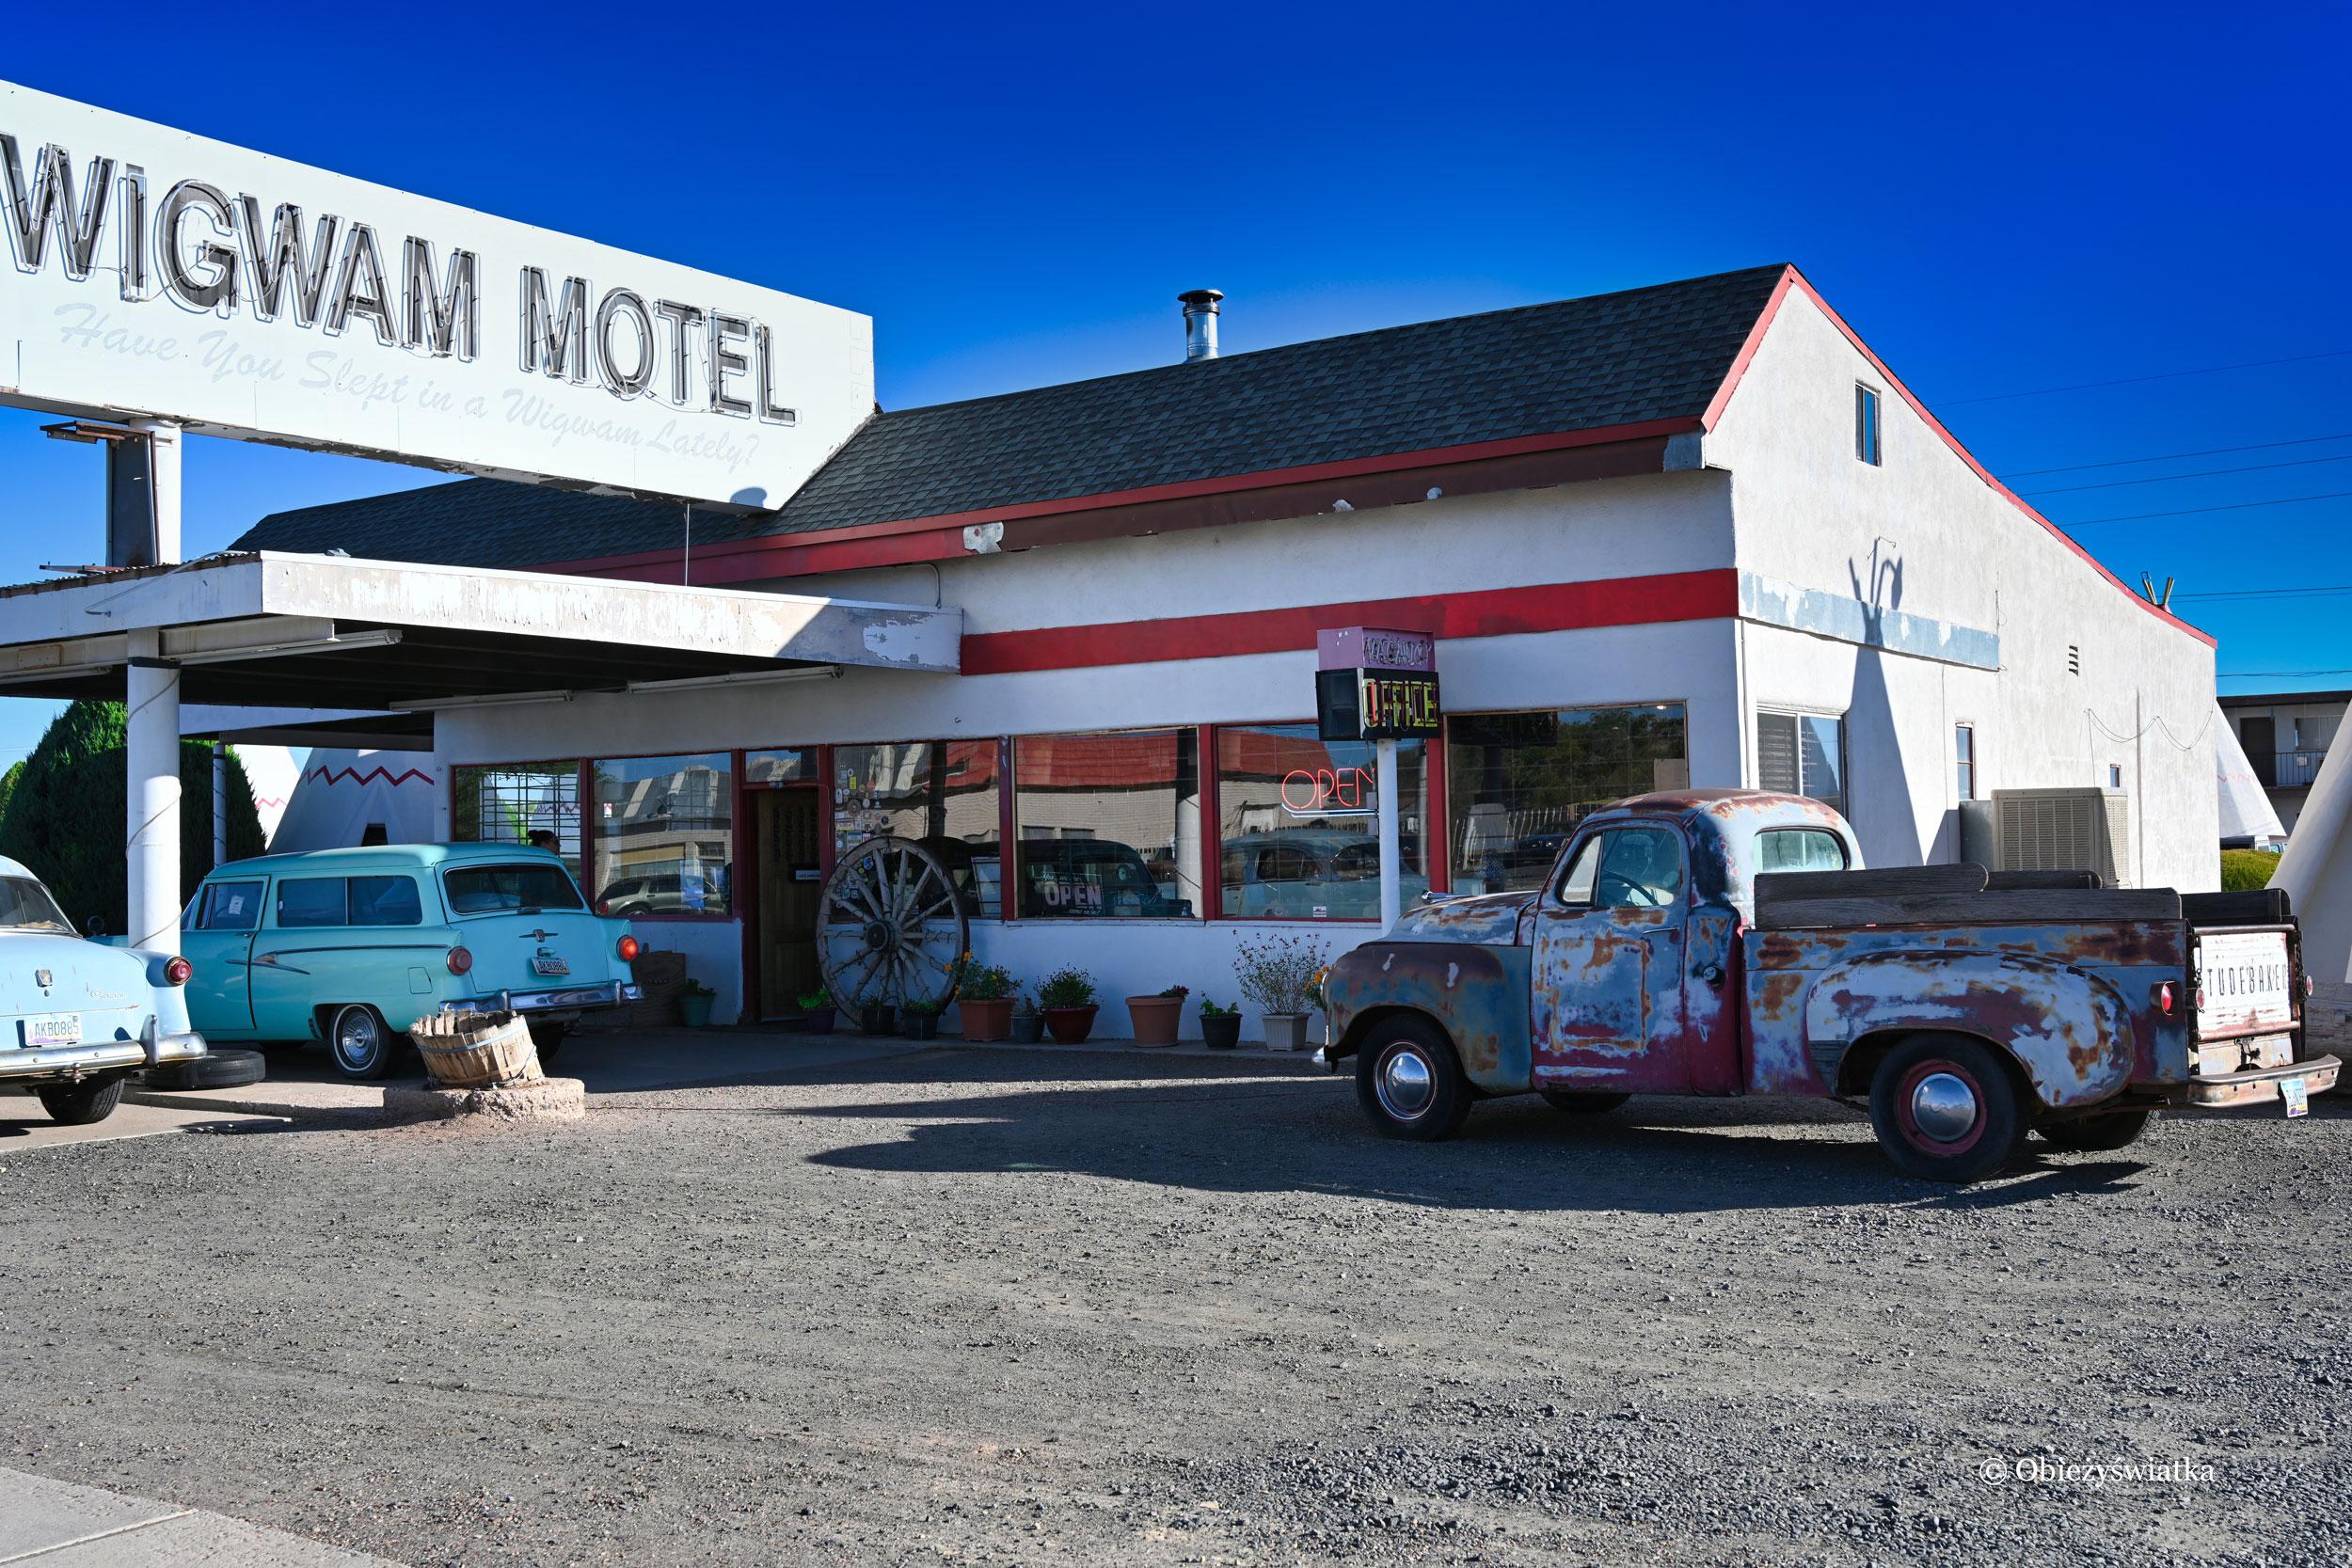 Motel Wigwam w Holbrook, Arizona na trasie Route 66